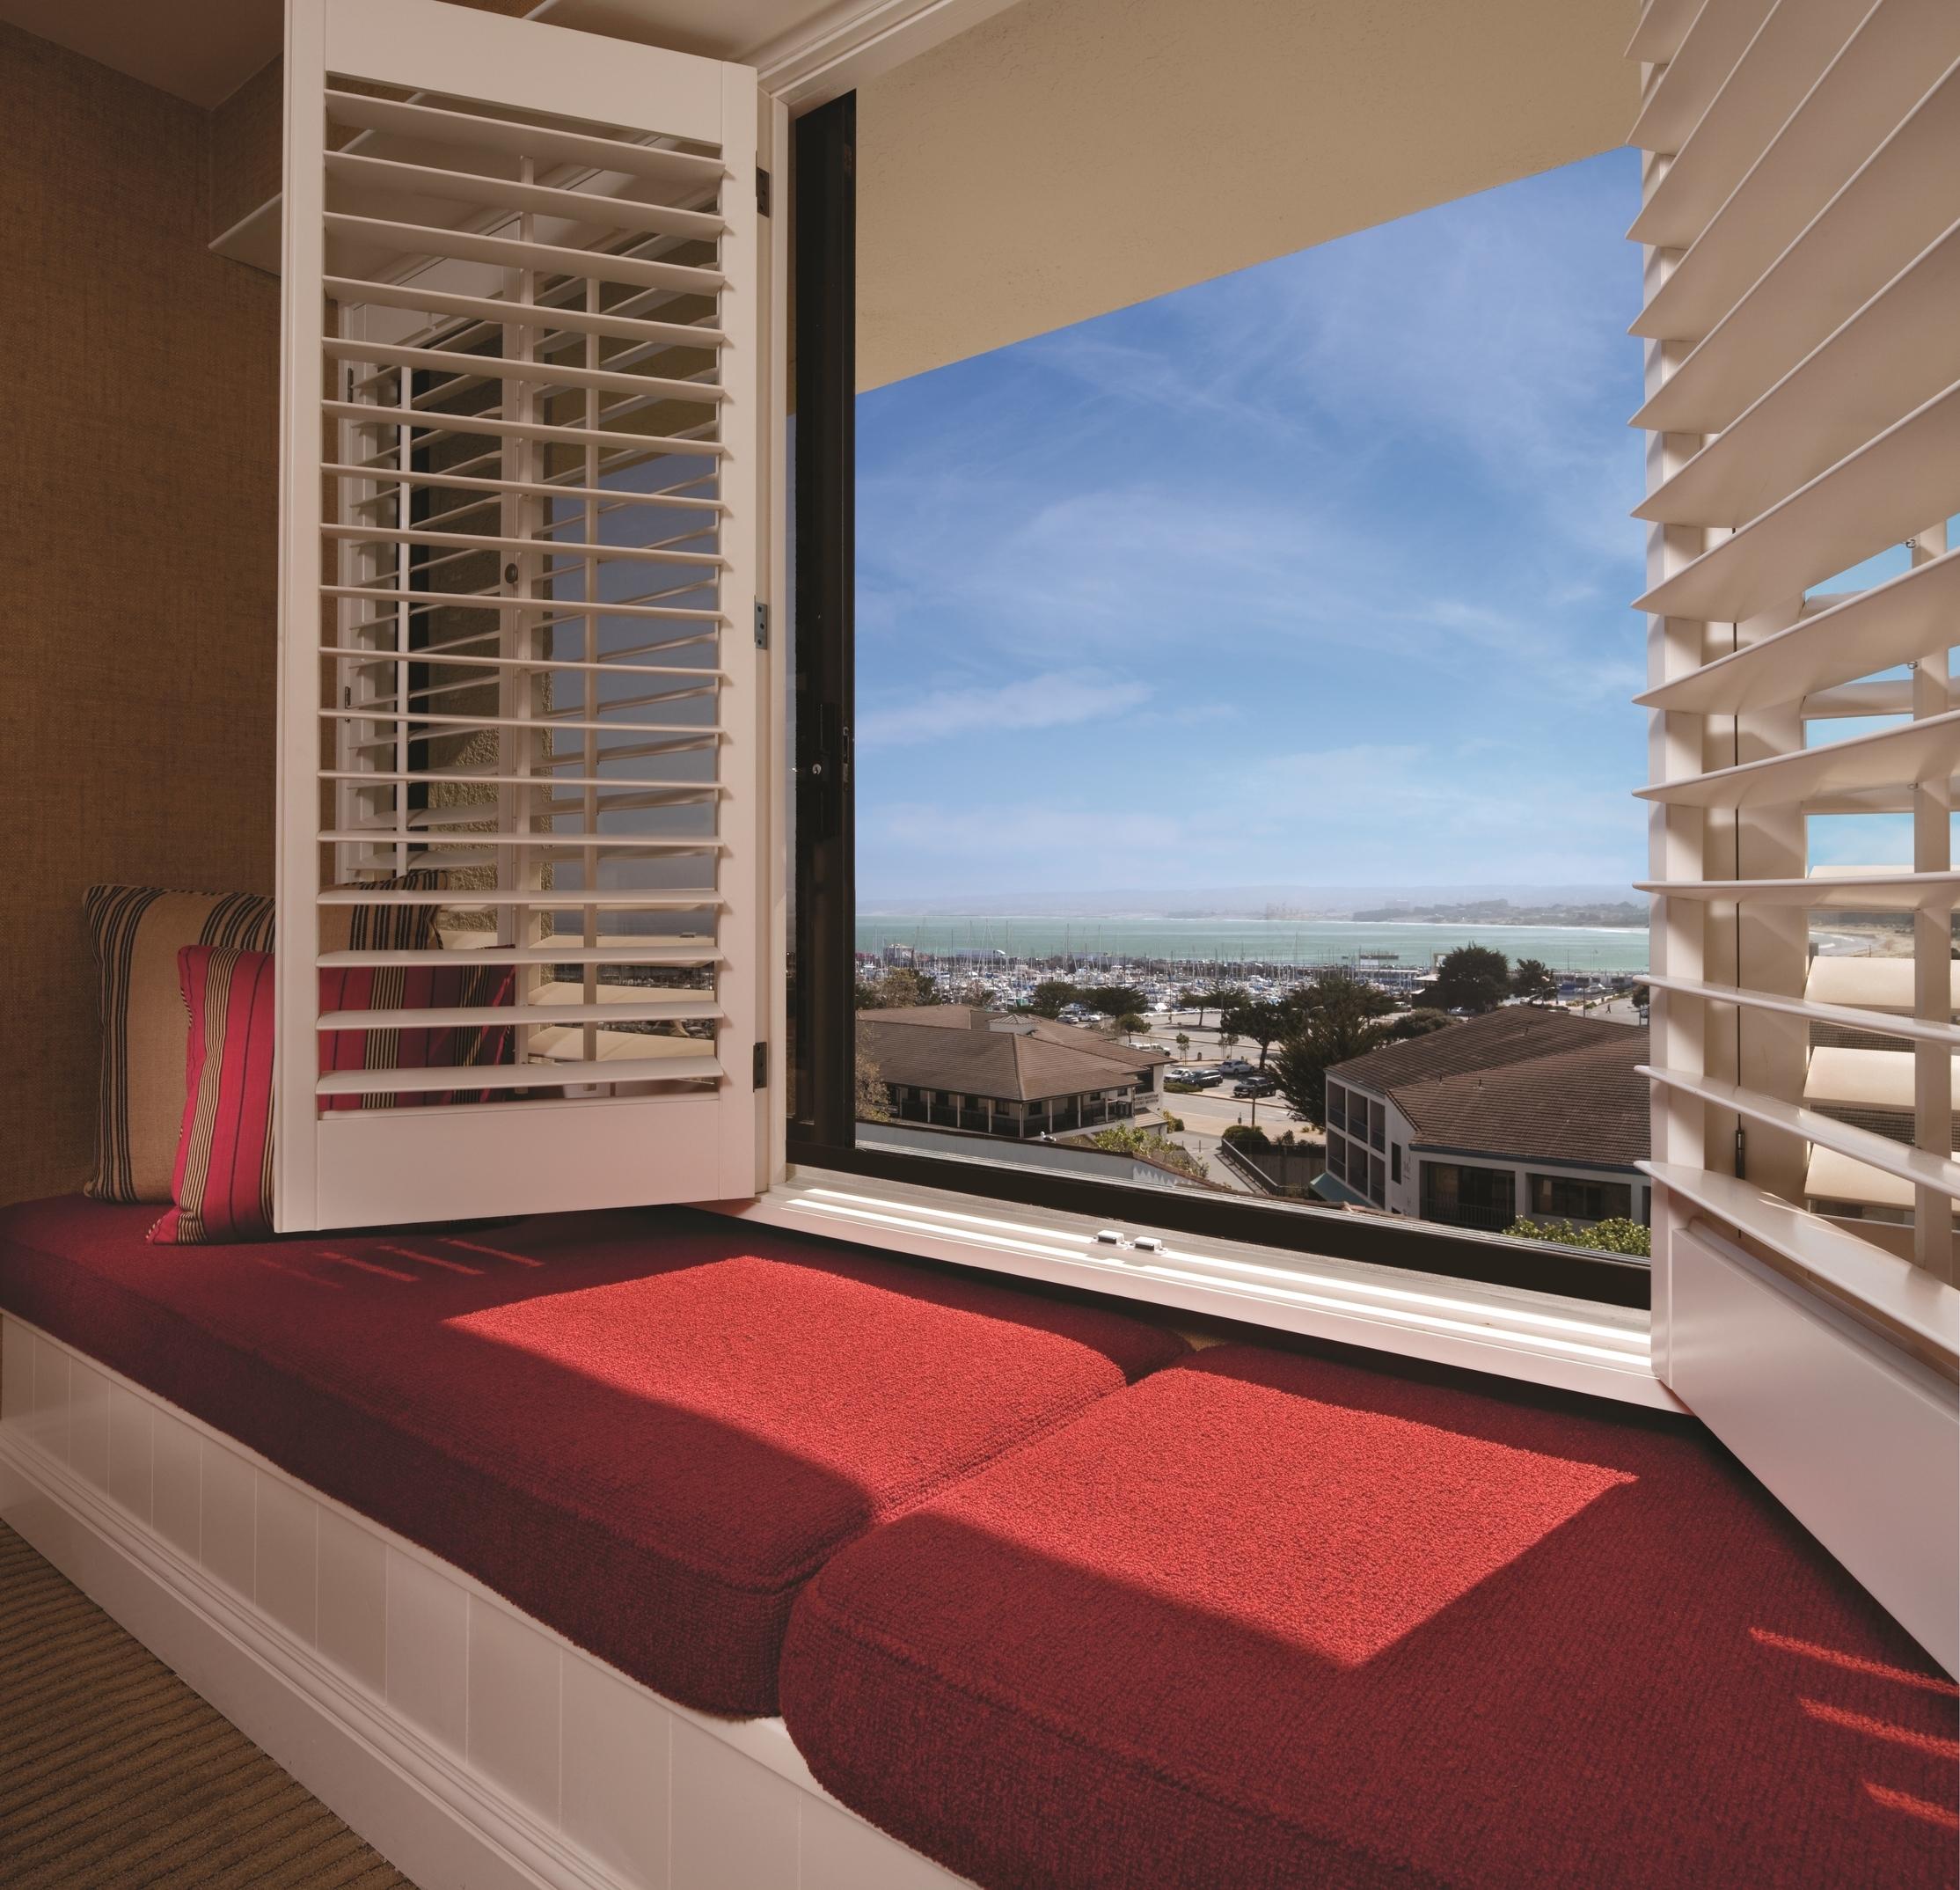 Portola Hotel & Spa at Monterey Bay image 3